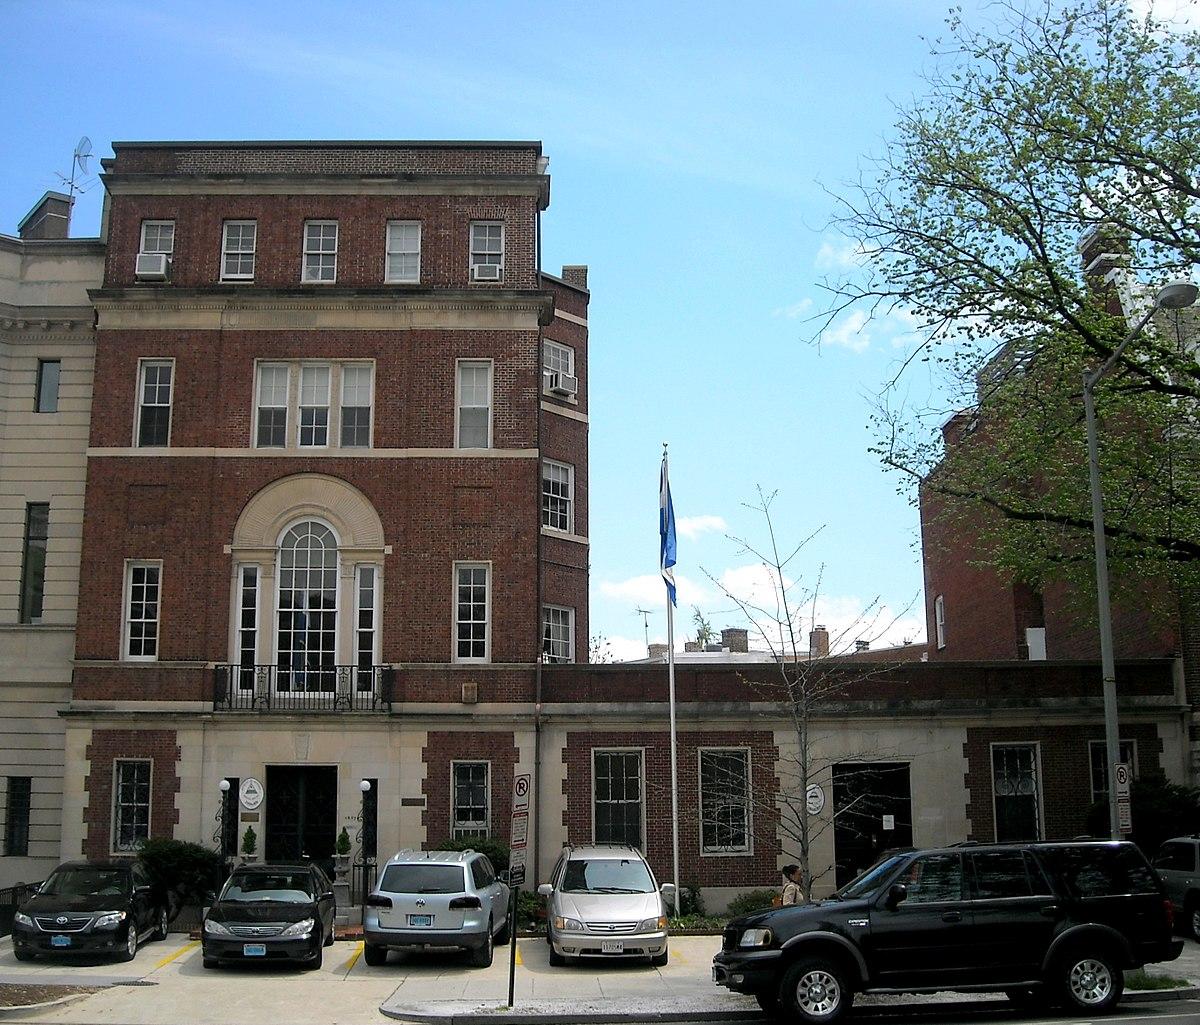 Embassy of Nicaragua in Washington, D.C. - Wikipedia